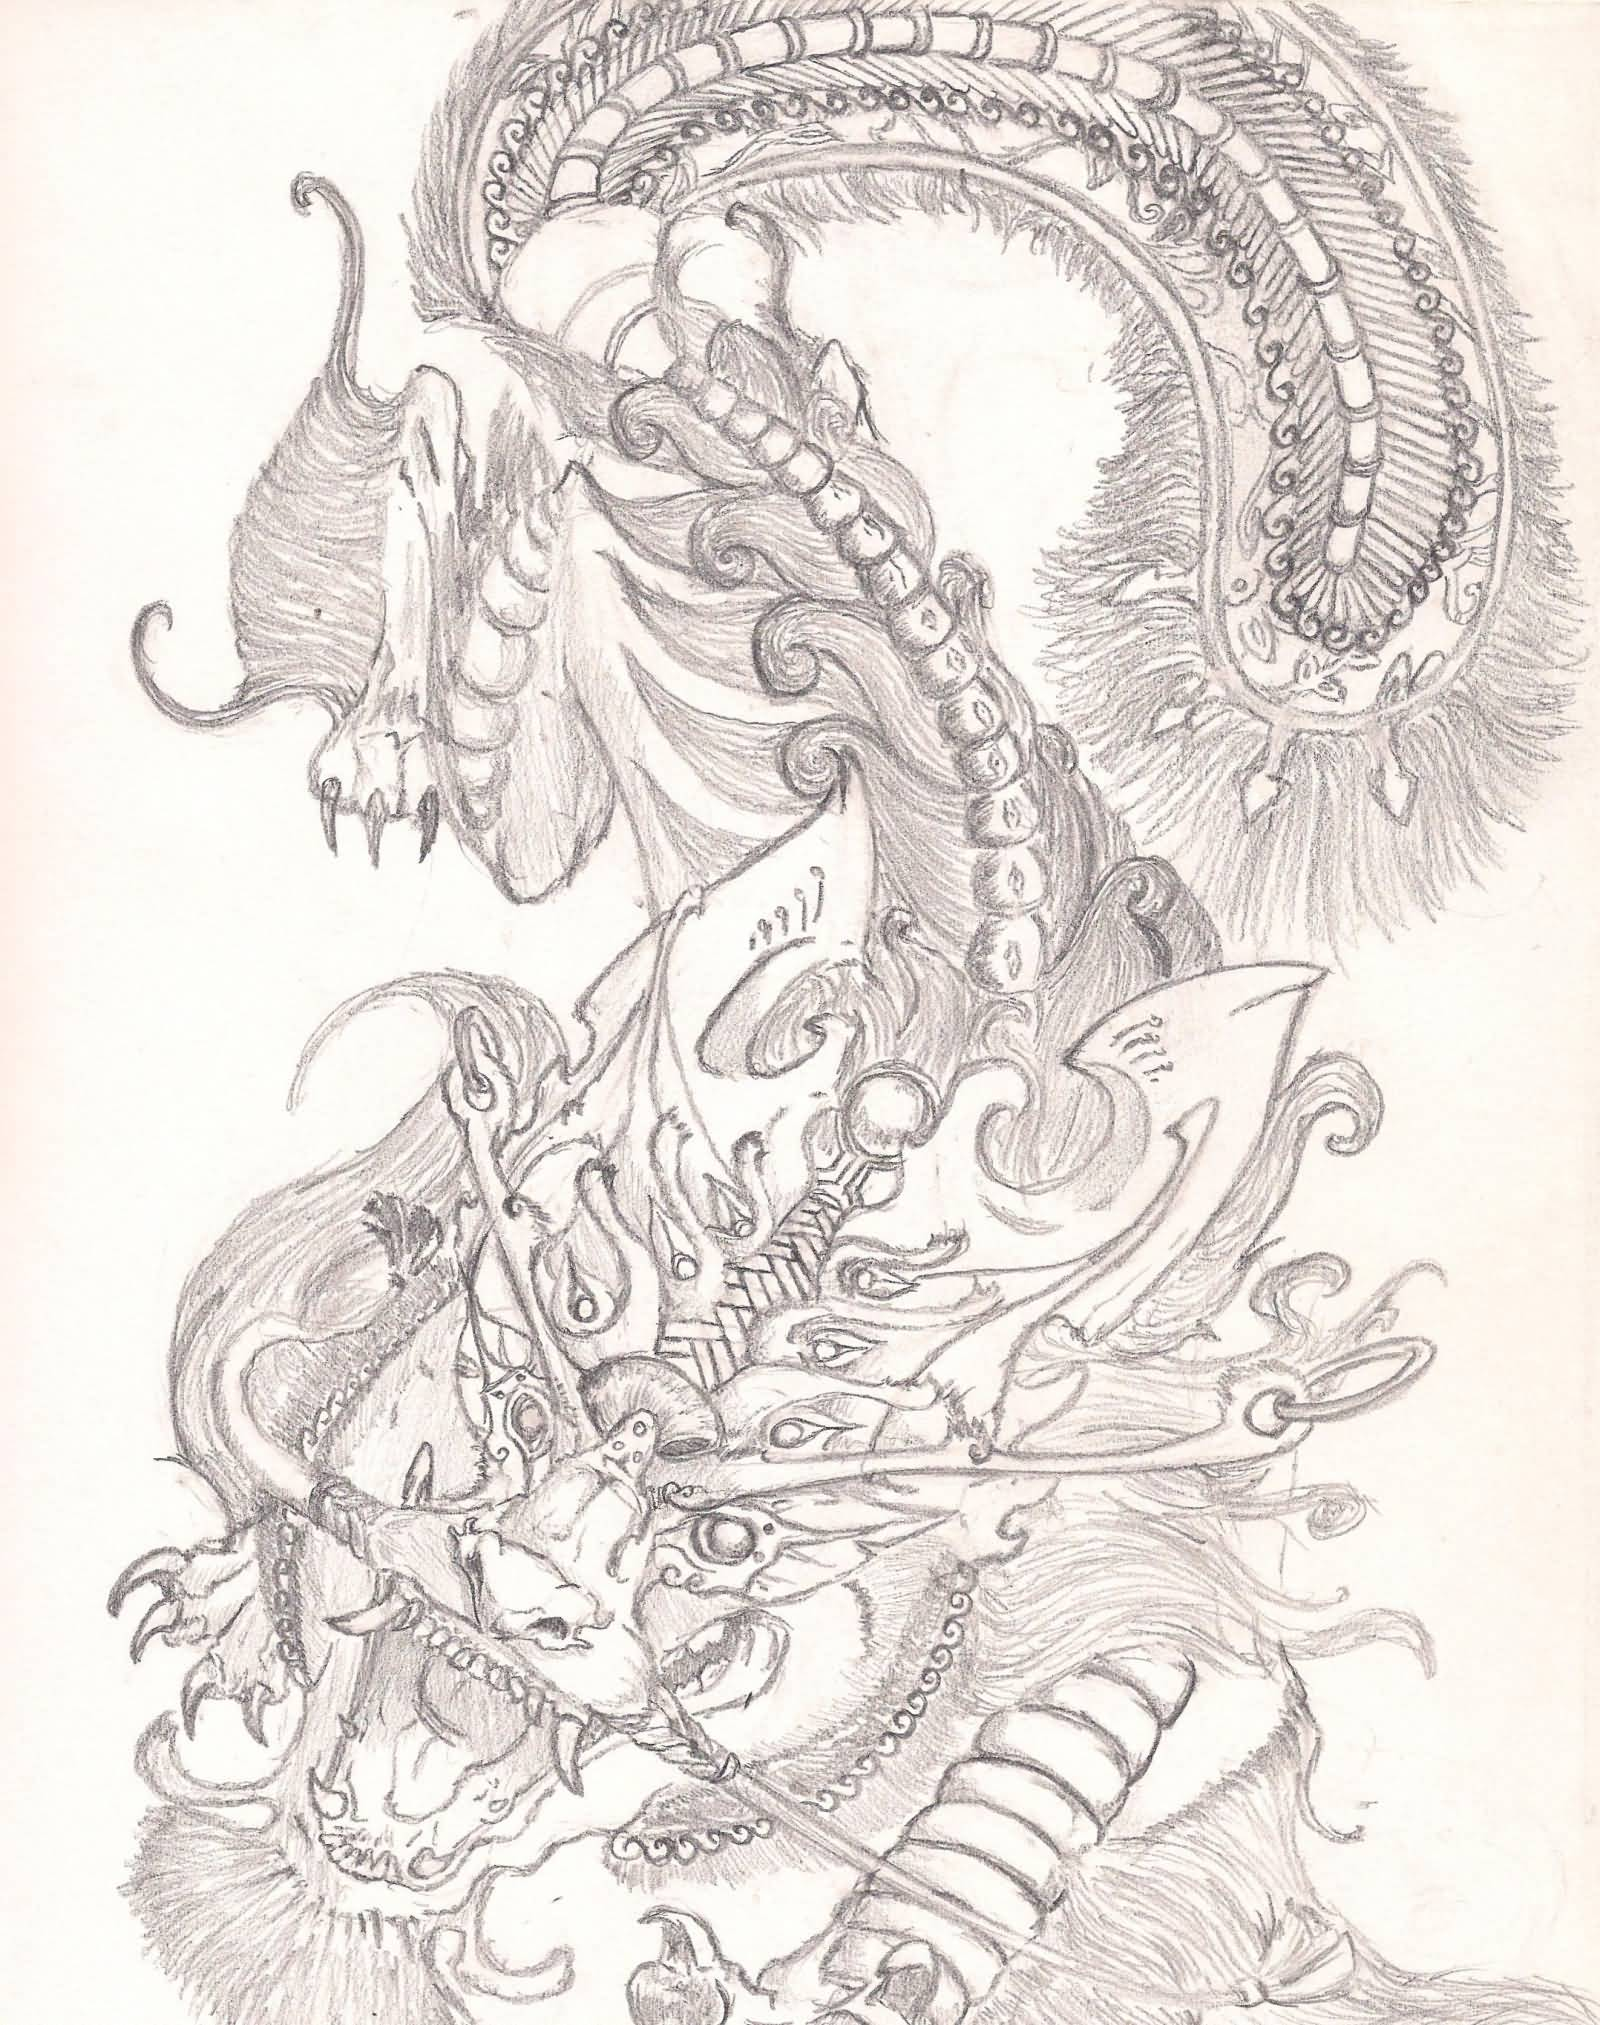 Superb Chinese Foo Dog Tattoo Design By Ronisamurai87